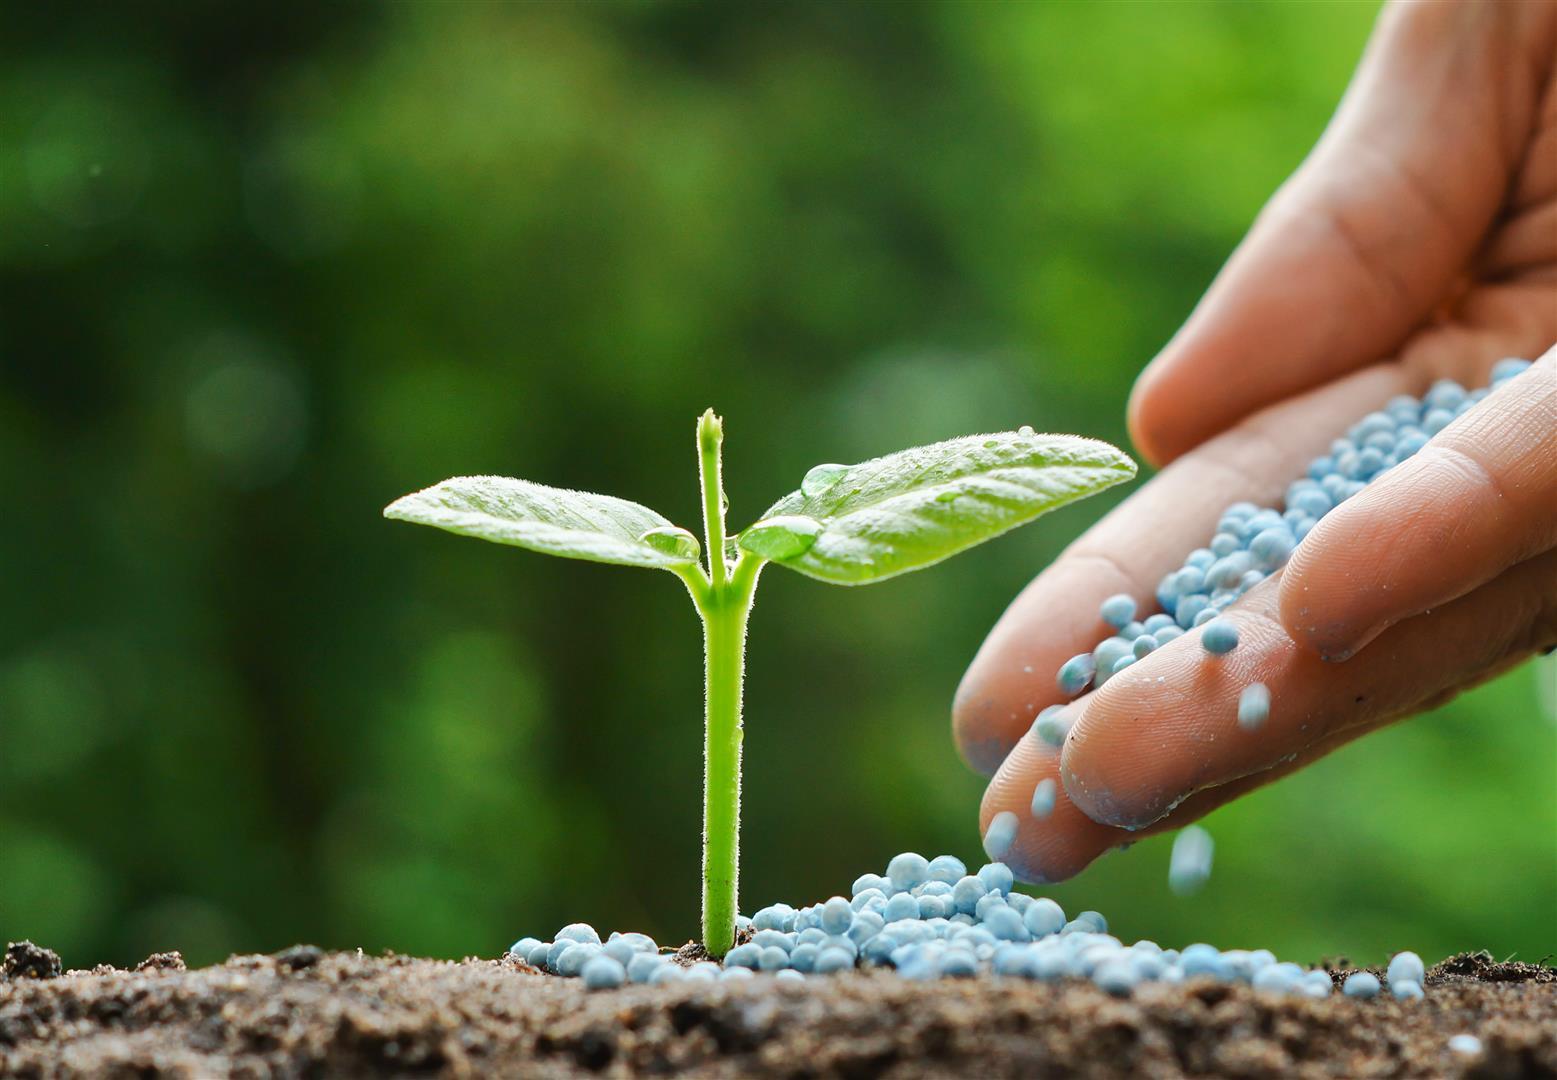 Entrega de fertilizantes no Brasil tem recorde mensal; analista vê alta de 7% no Ano